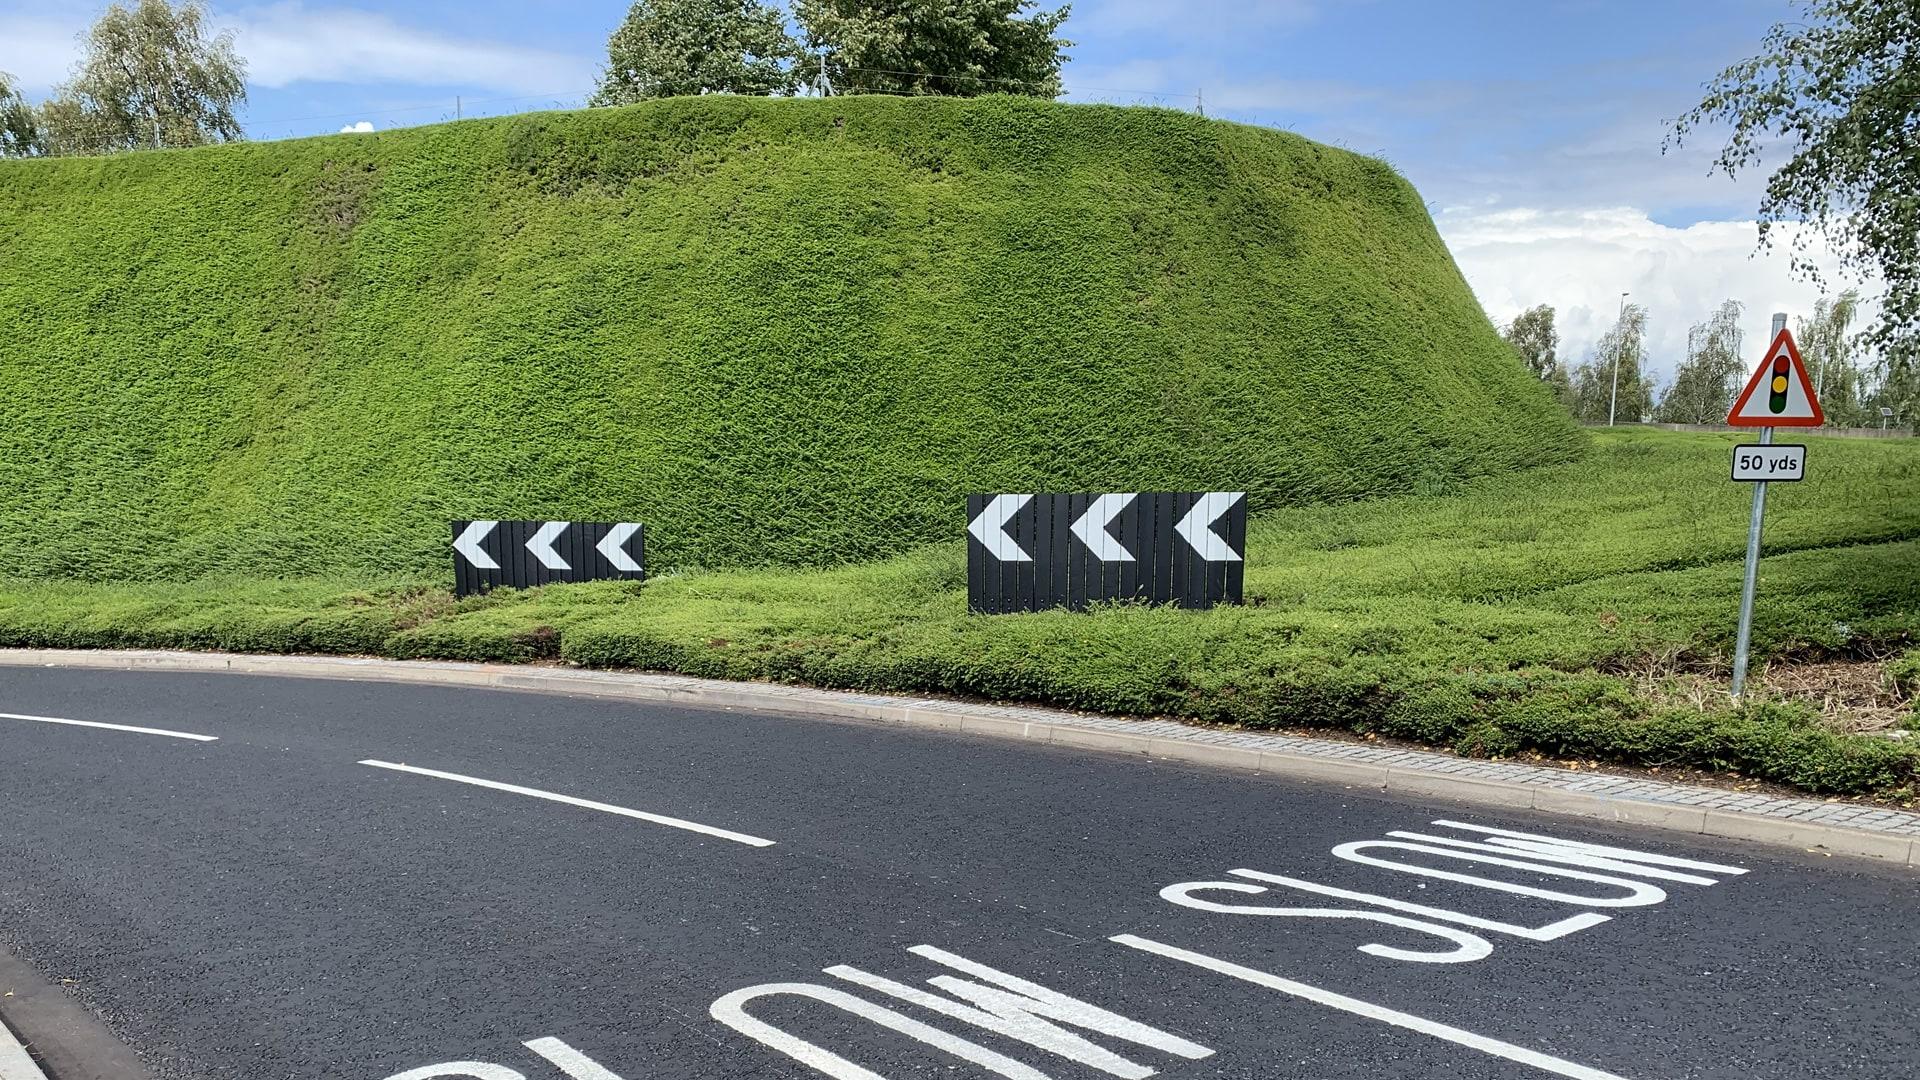 Evo-Chev Passive Chevron on road at Heathrow